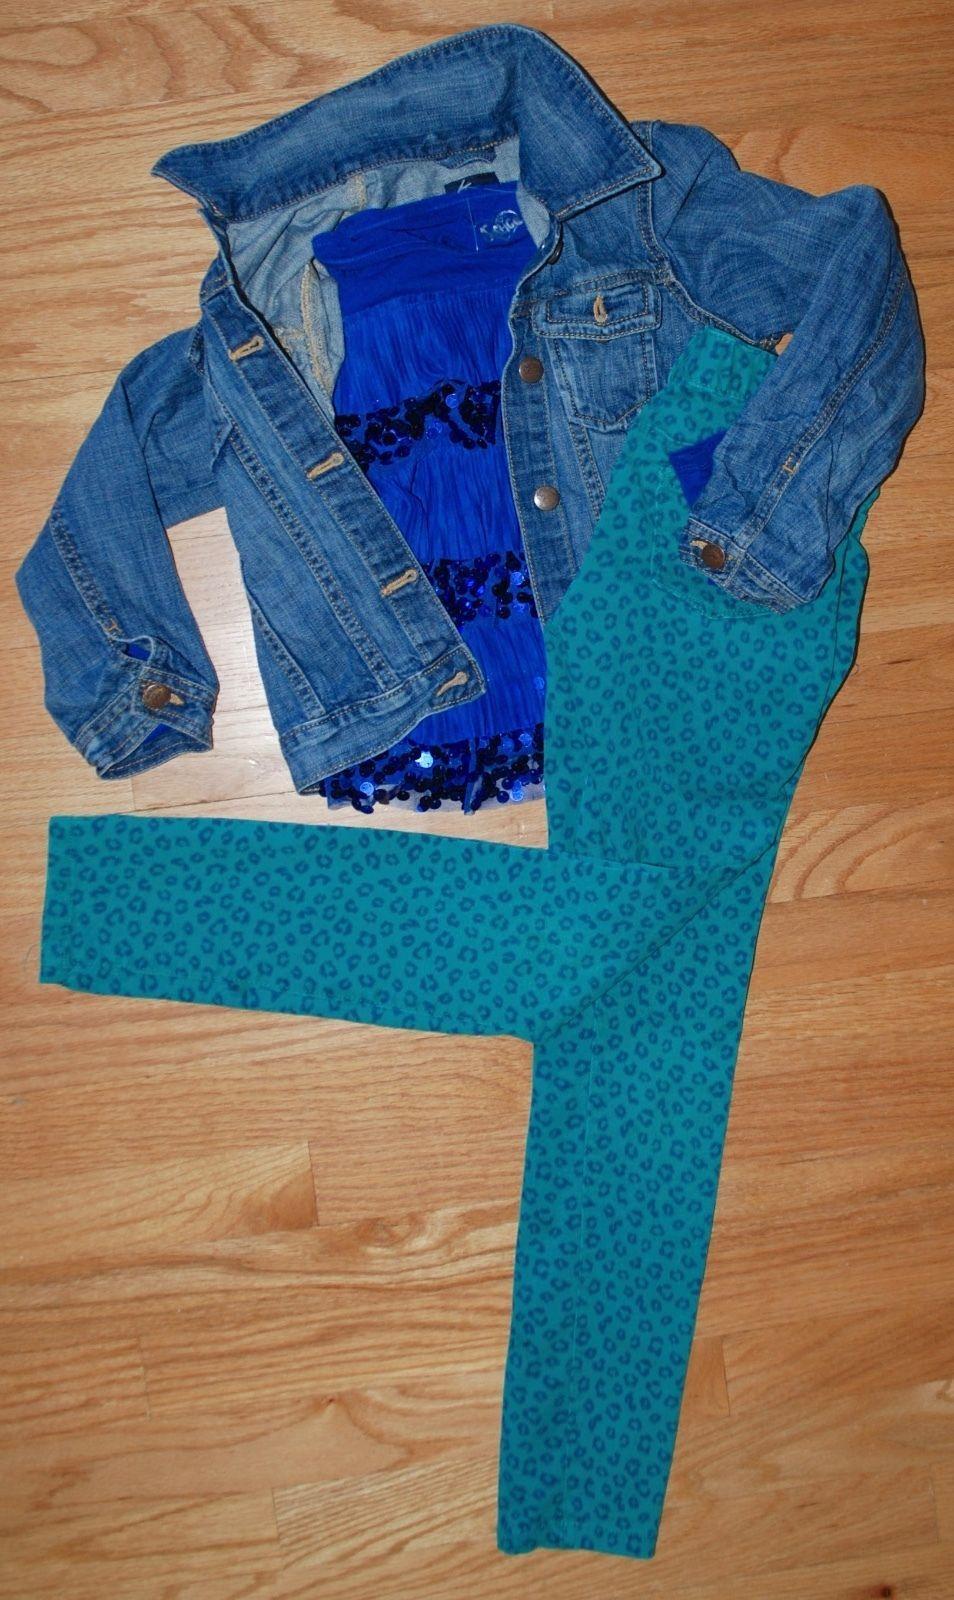 Gap Kids Outfit Set - Jean Jacket ON Leopard Skinny Jeans Jeggings + Justice Top